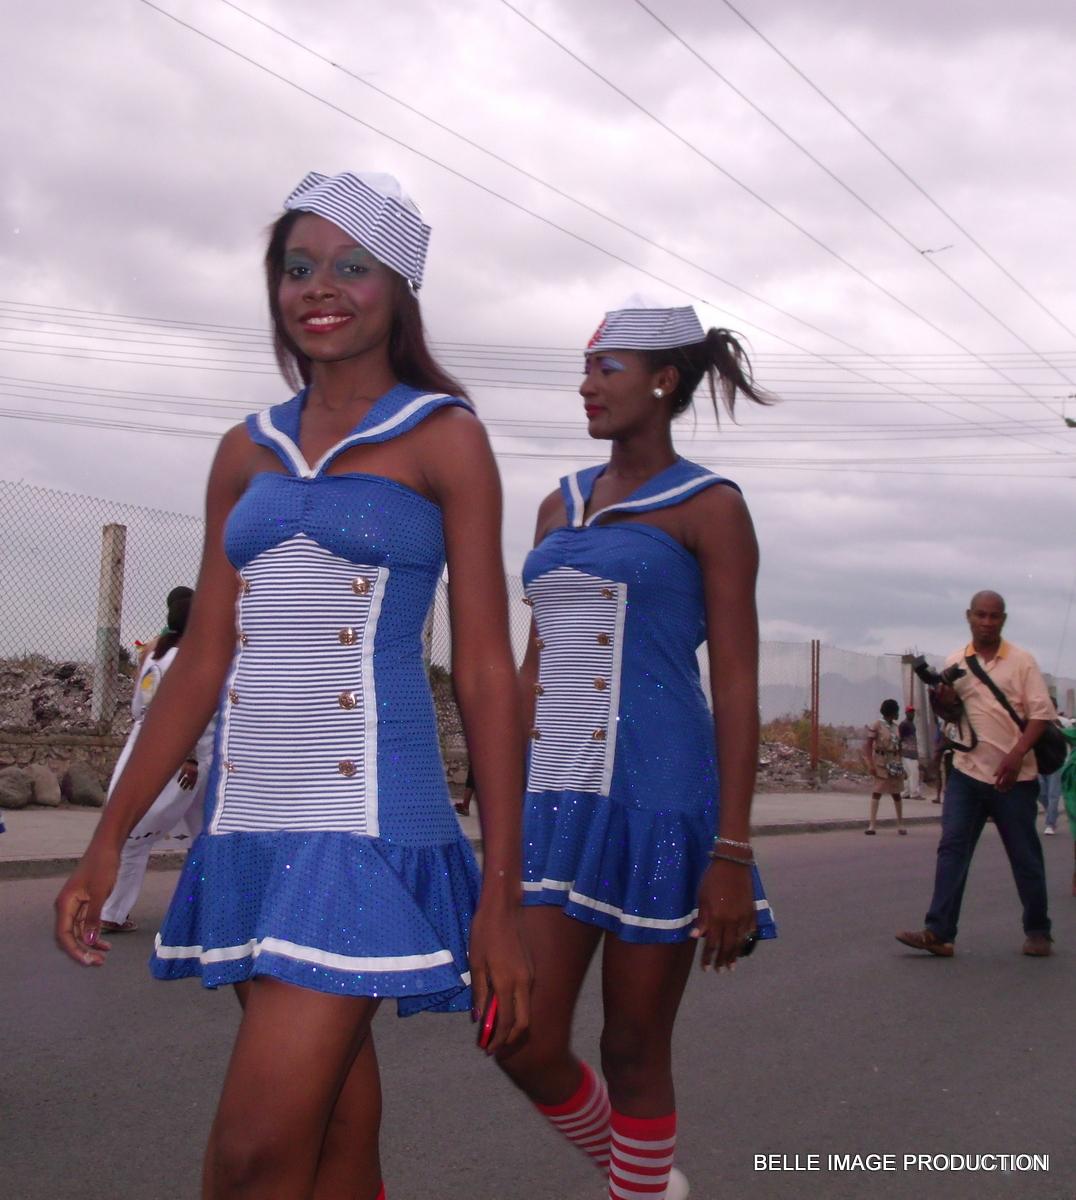 Festival de la mer au Cap-Haitien  :13 au 15 juille saki rete anko  nan vil Okap 26-26-GEDC0048